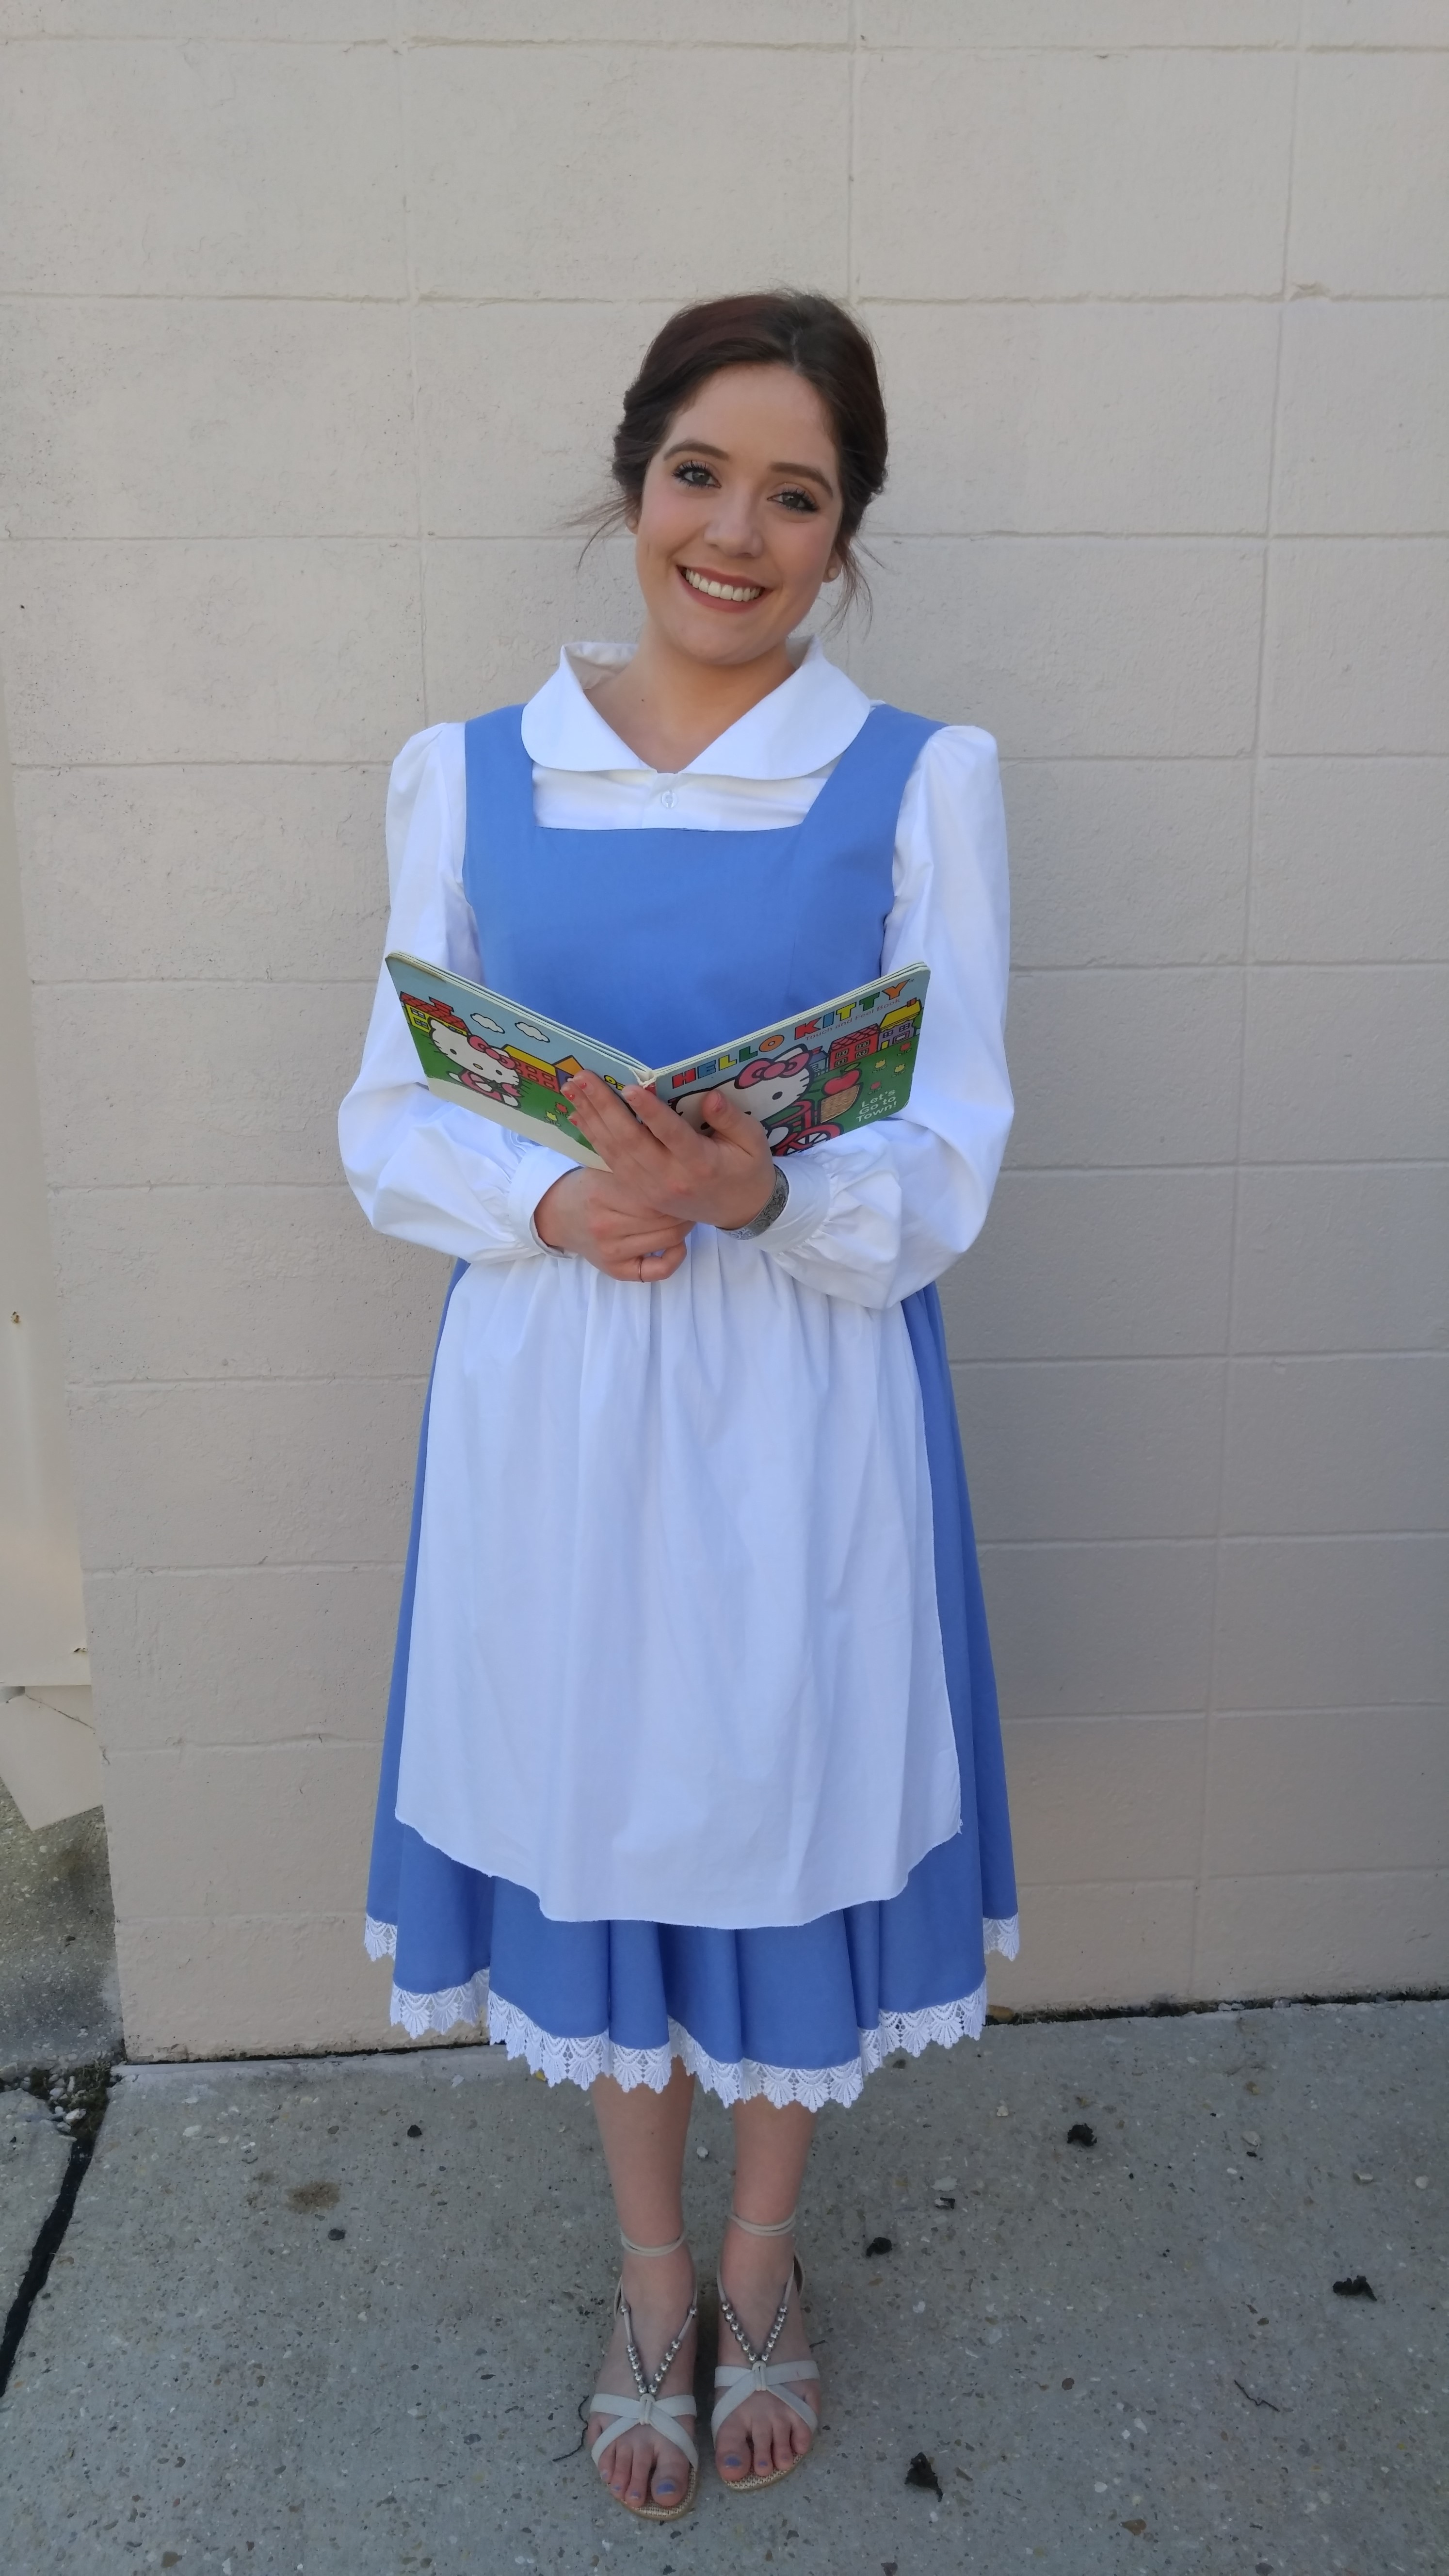 Storytime Belle